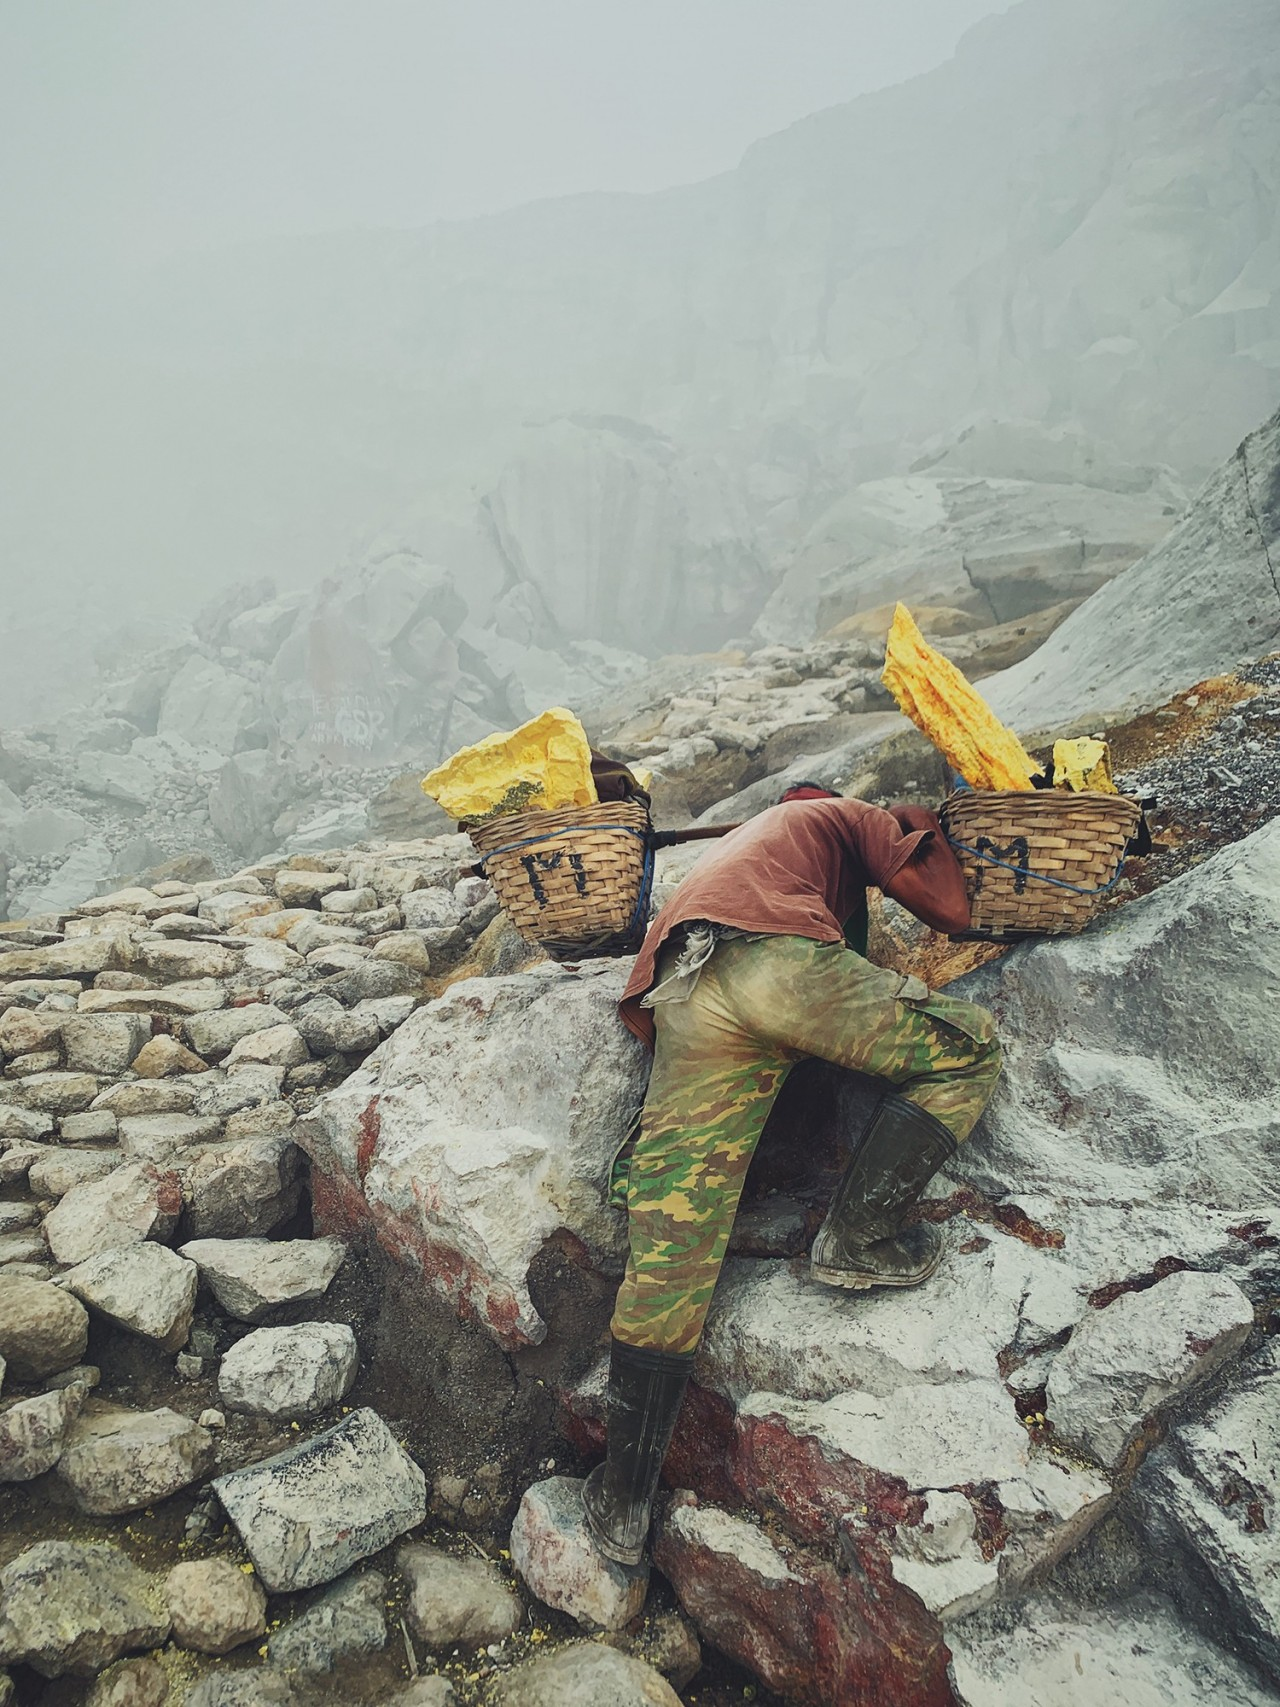 3 место в категории «Образ жизни», 2020. «Золото дьявола» (природная сера). Вулкан Кава Иджен, Индонезия. Автор Лю Дан